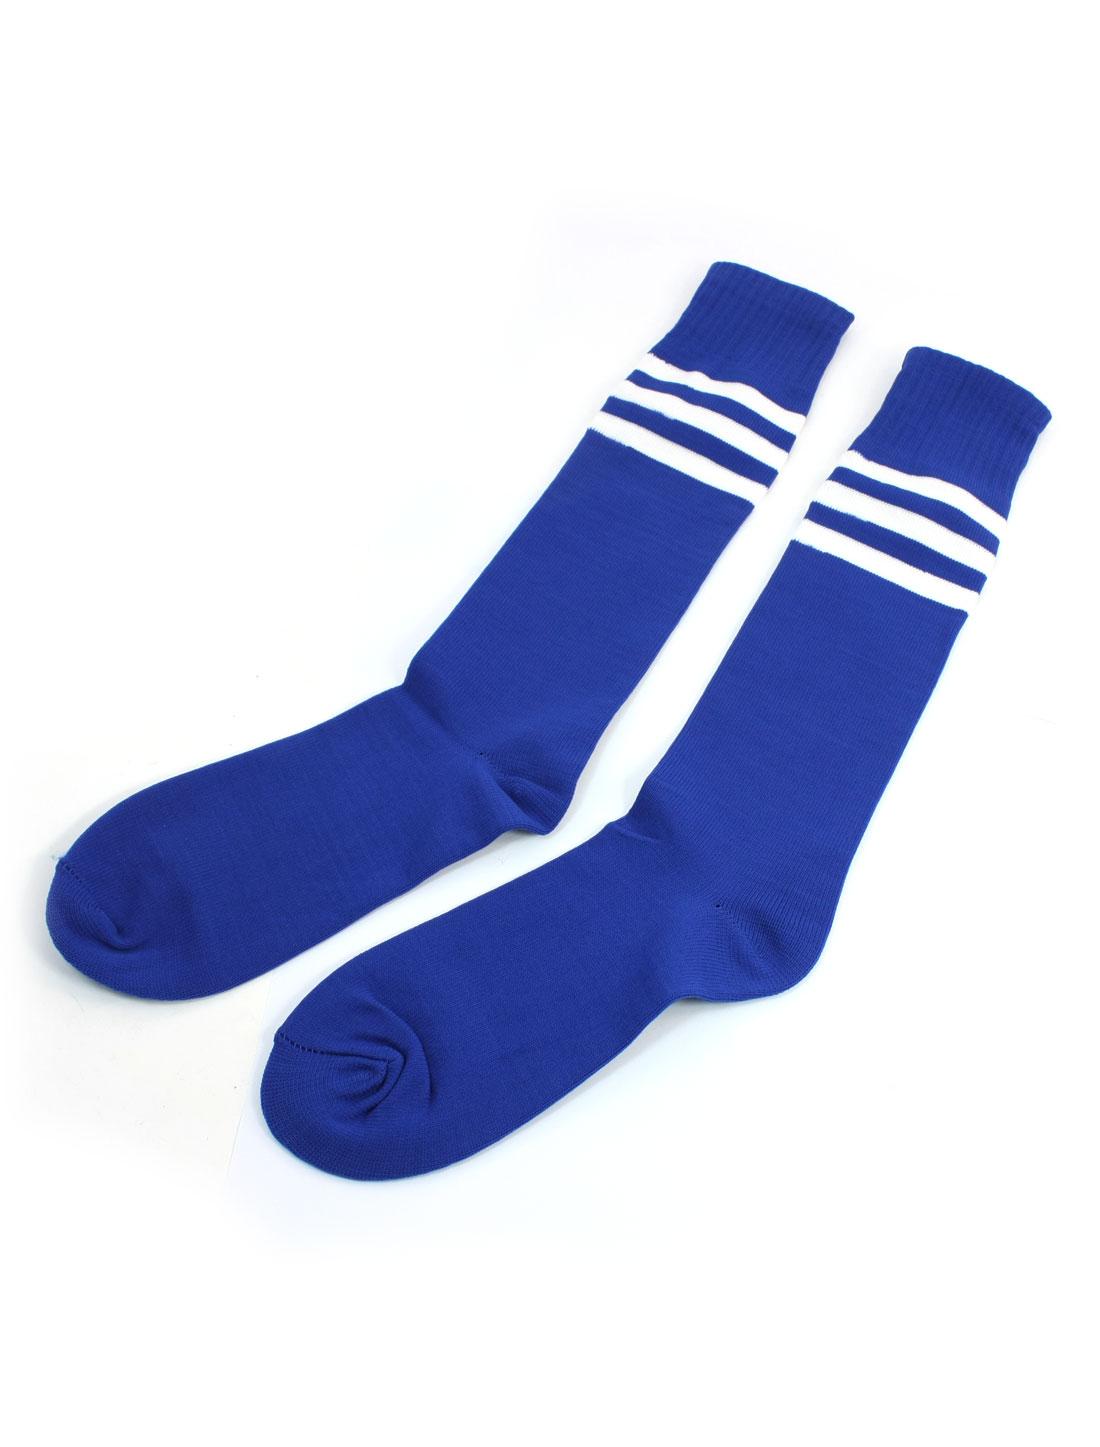 Pair Knee High Striped Stretch Soccer Football Sports Socks White Blue for Men